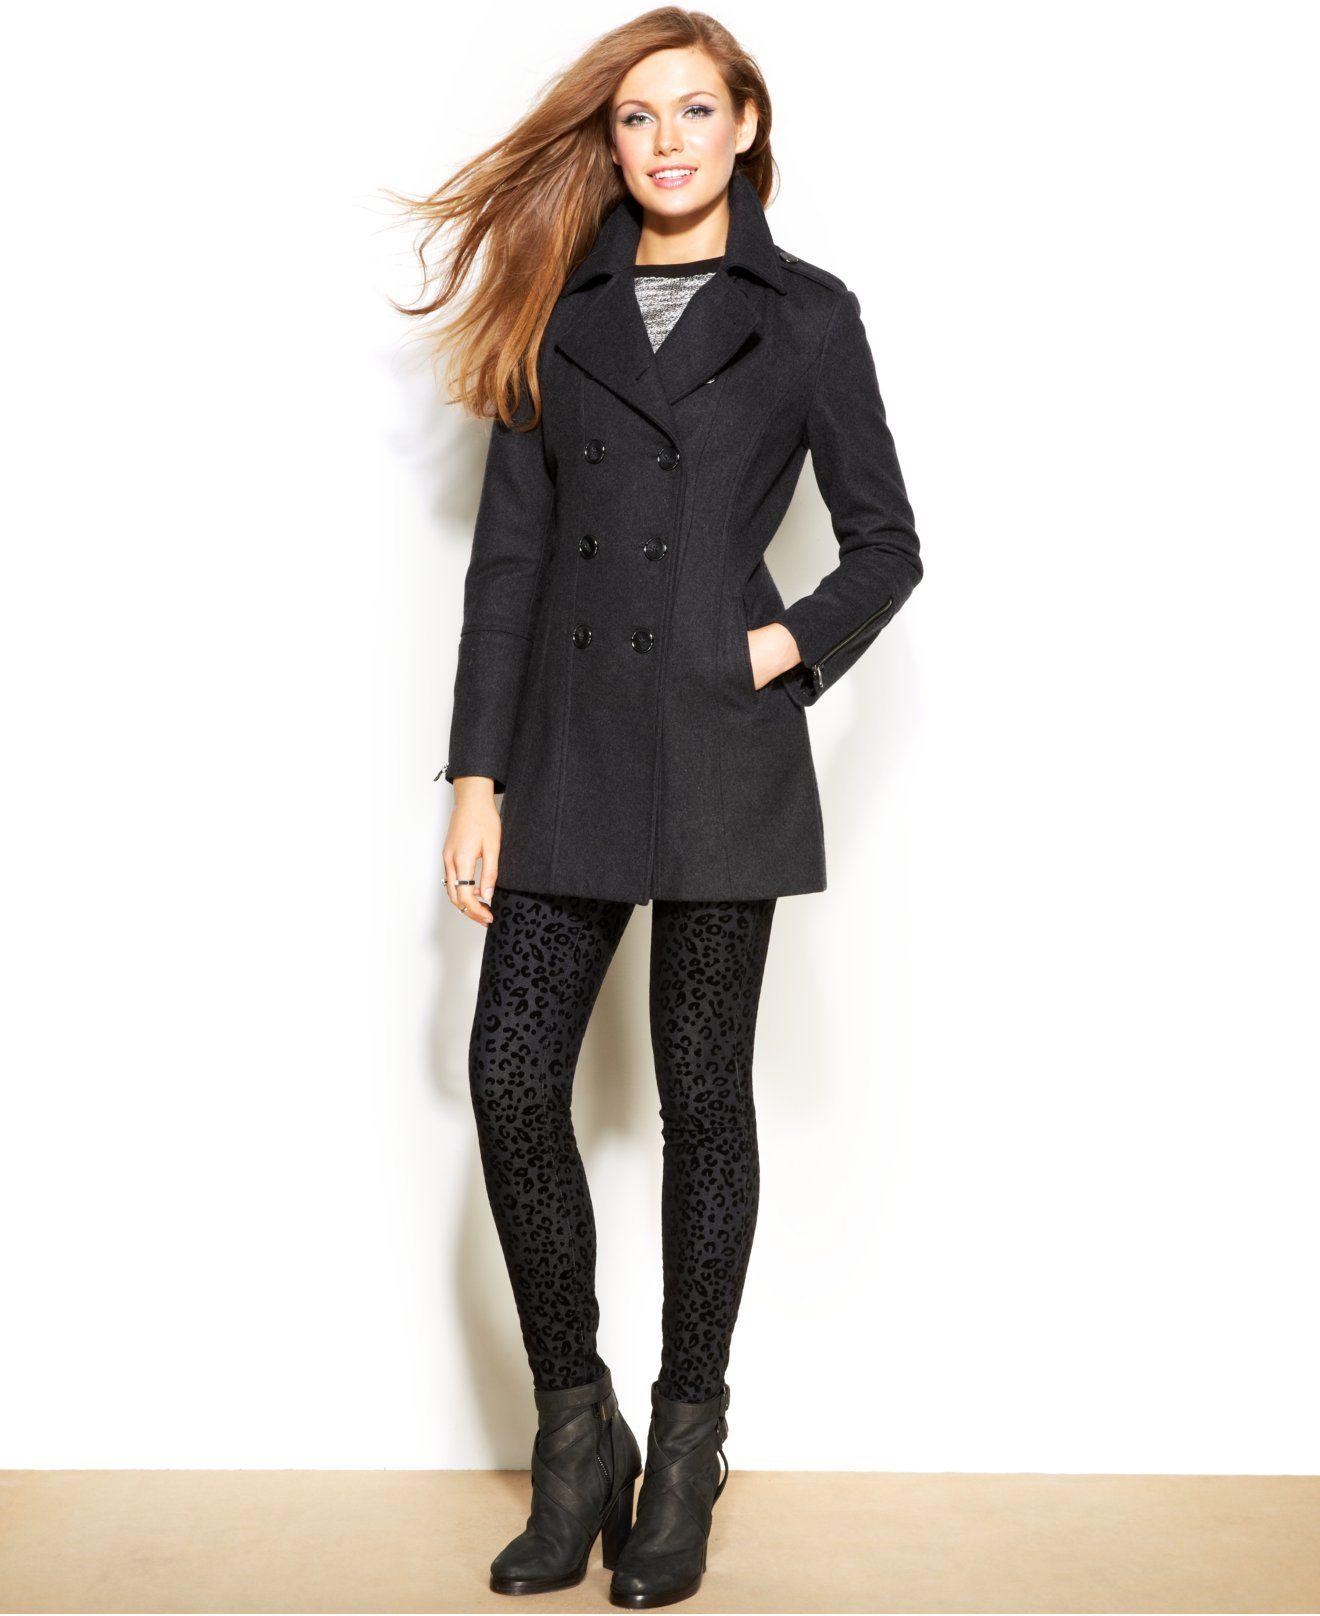 d9b56c517db Bar III Wool-Blend Double-Breasted Peacoat - Coats - Women - Macy's ...